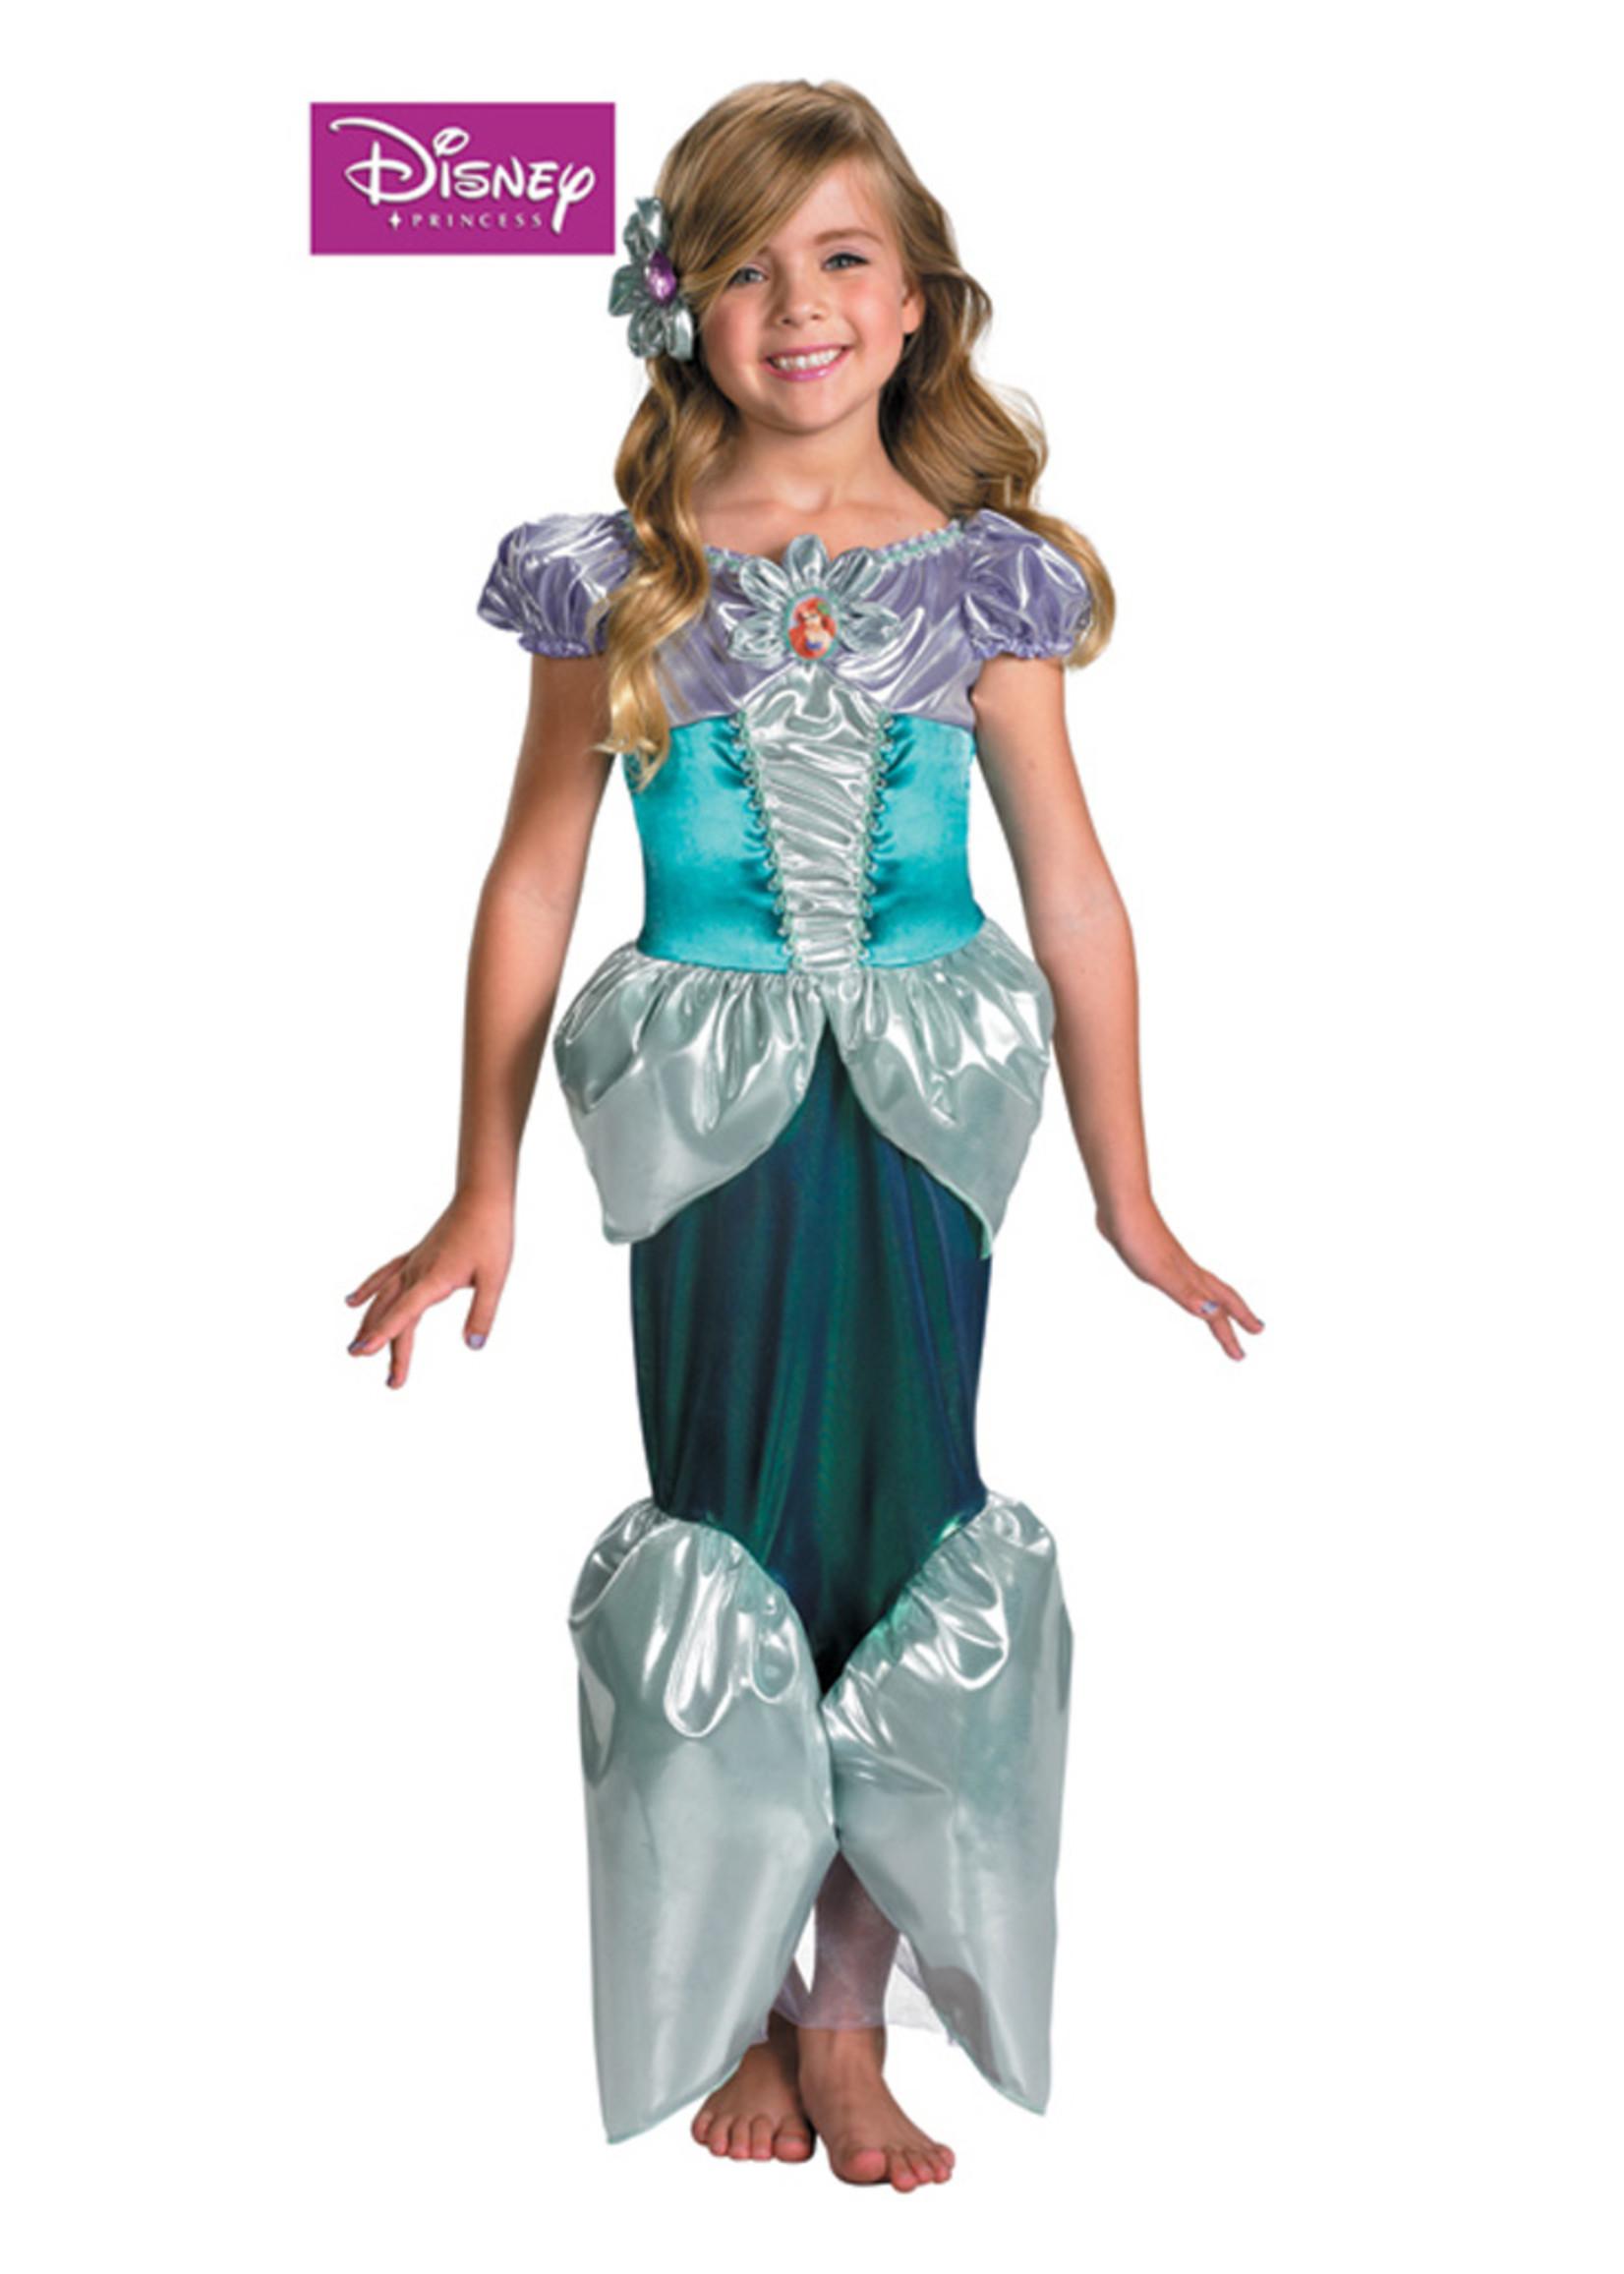 Ariel Shimmer Deluxe Costume - Girls